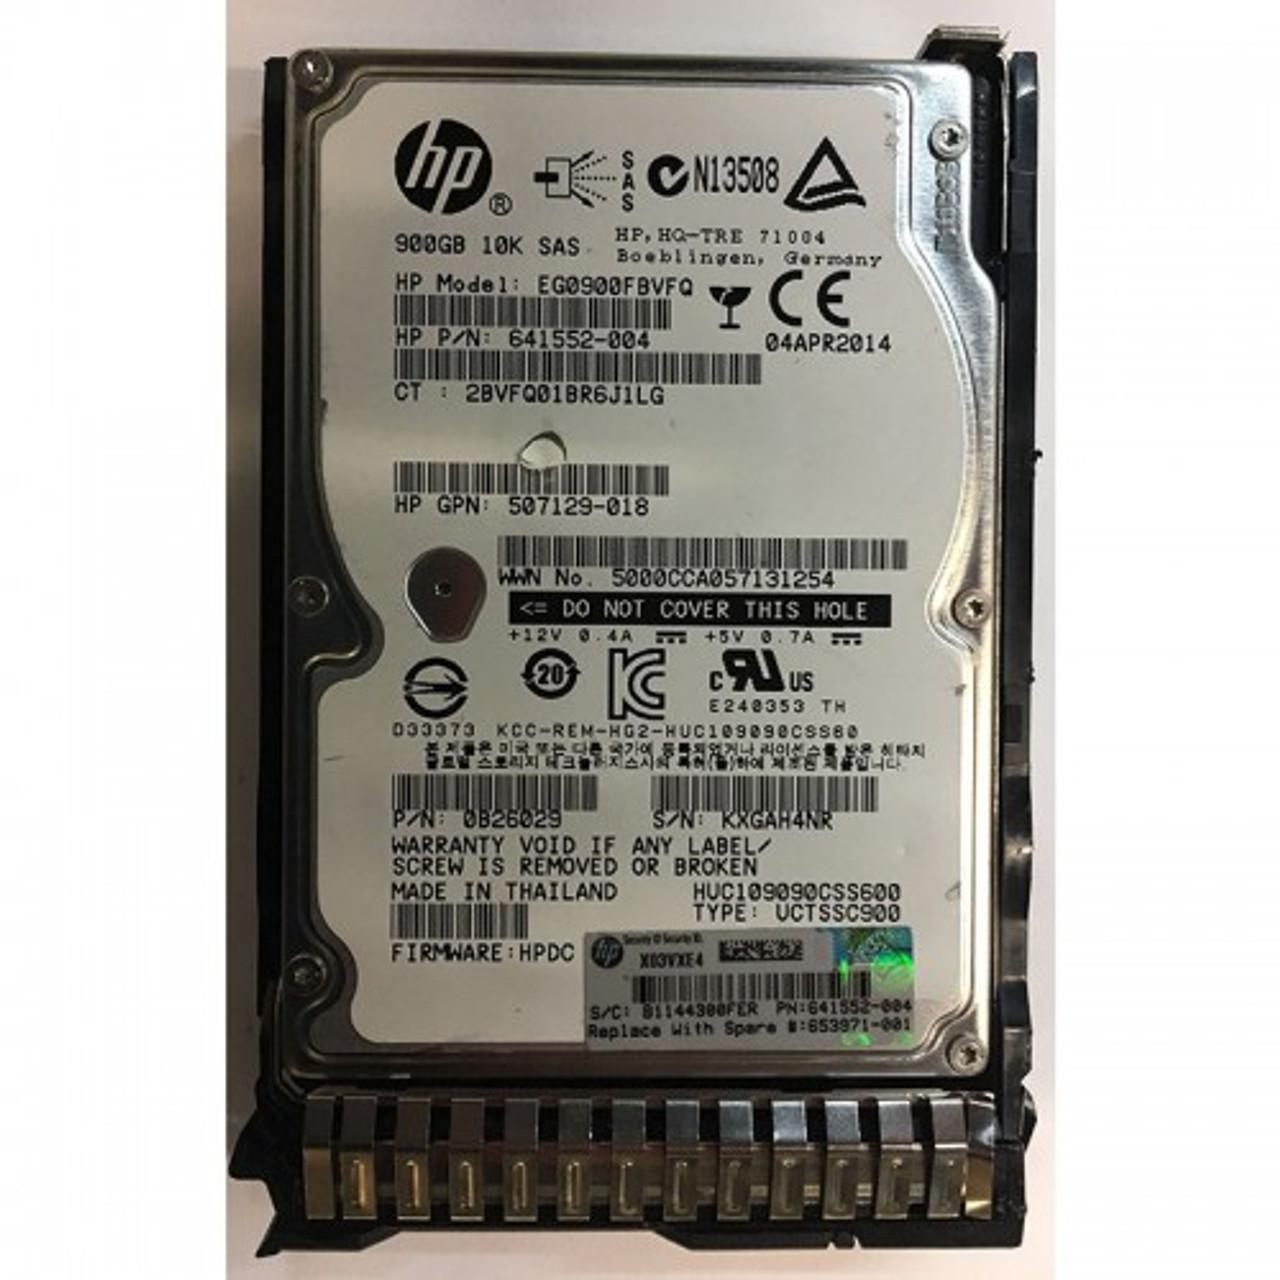 Eg0900fbvfq Hewlett-Packard 900Gb 10000Rpm 2.5Inch Sas 6Gbps Hard Dri